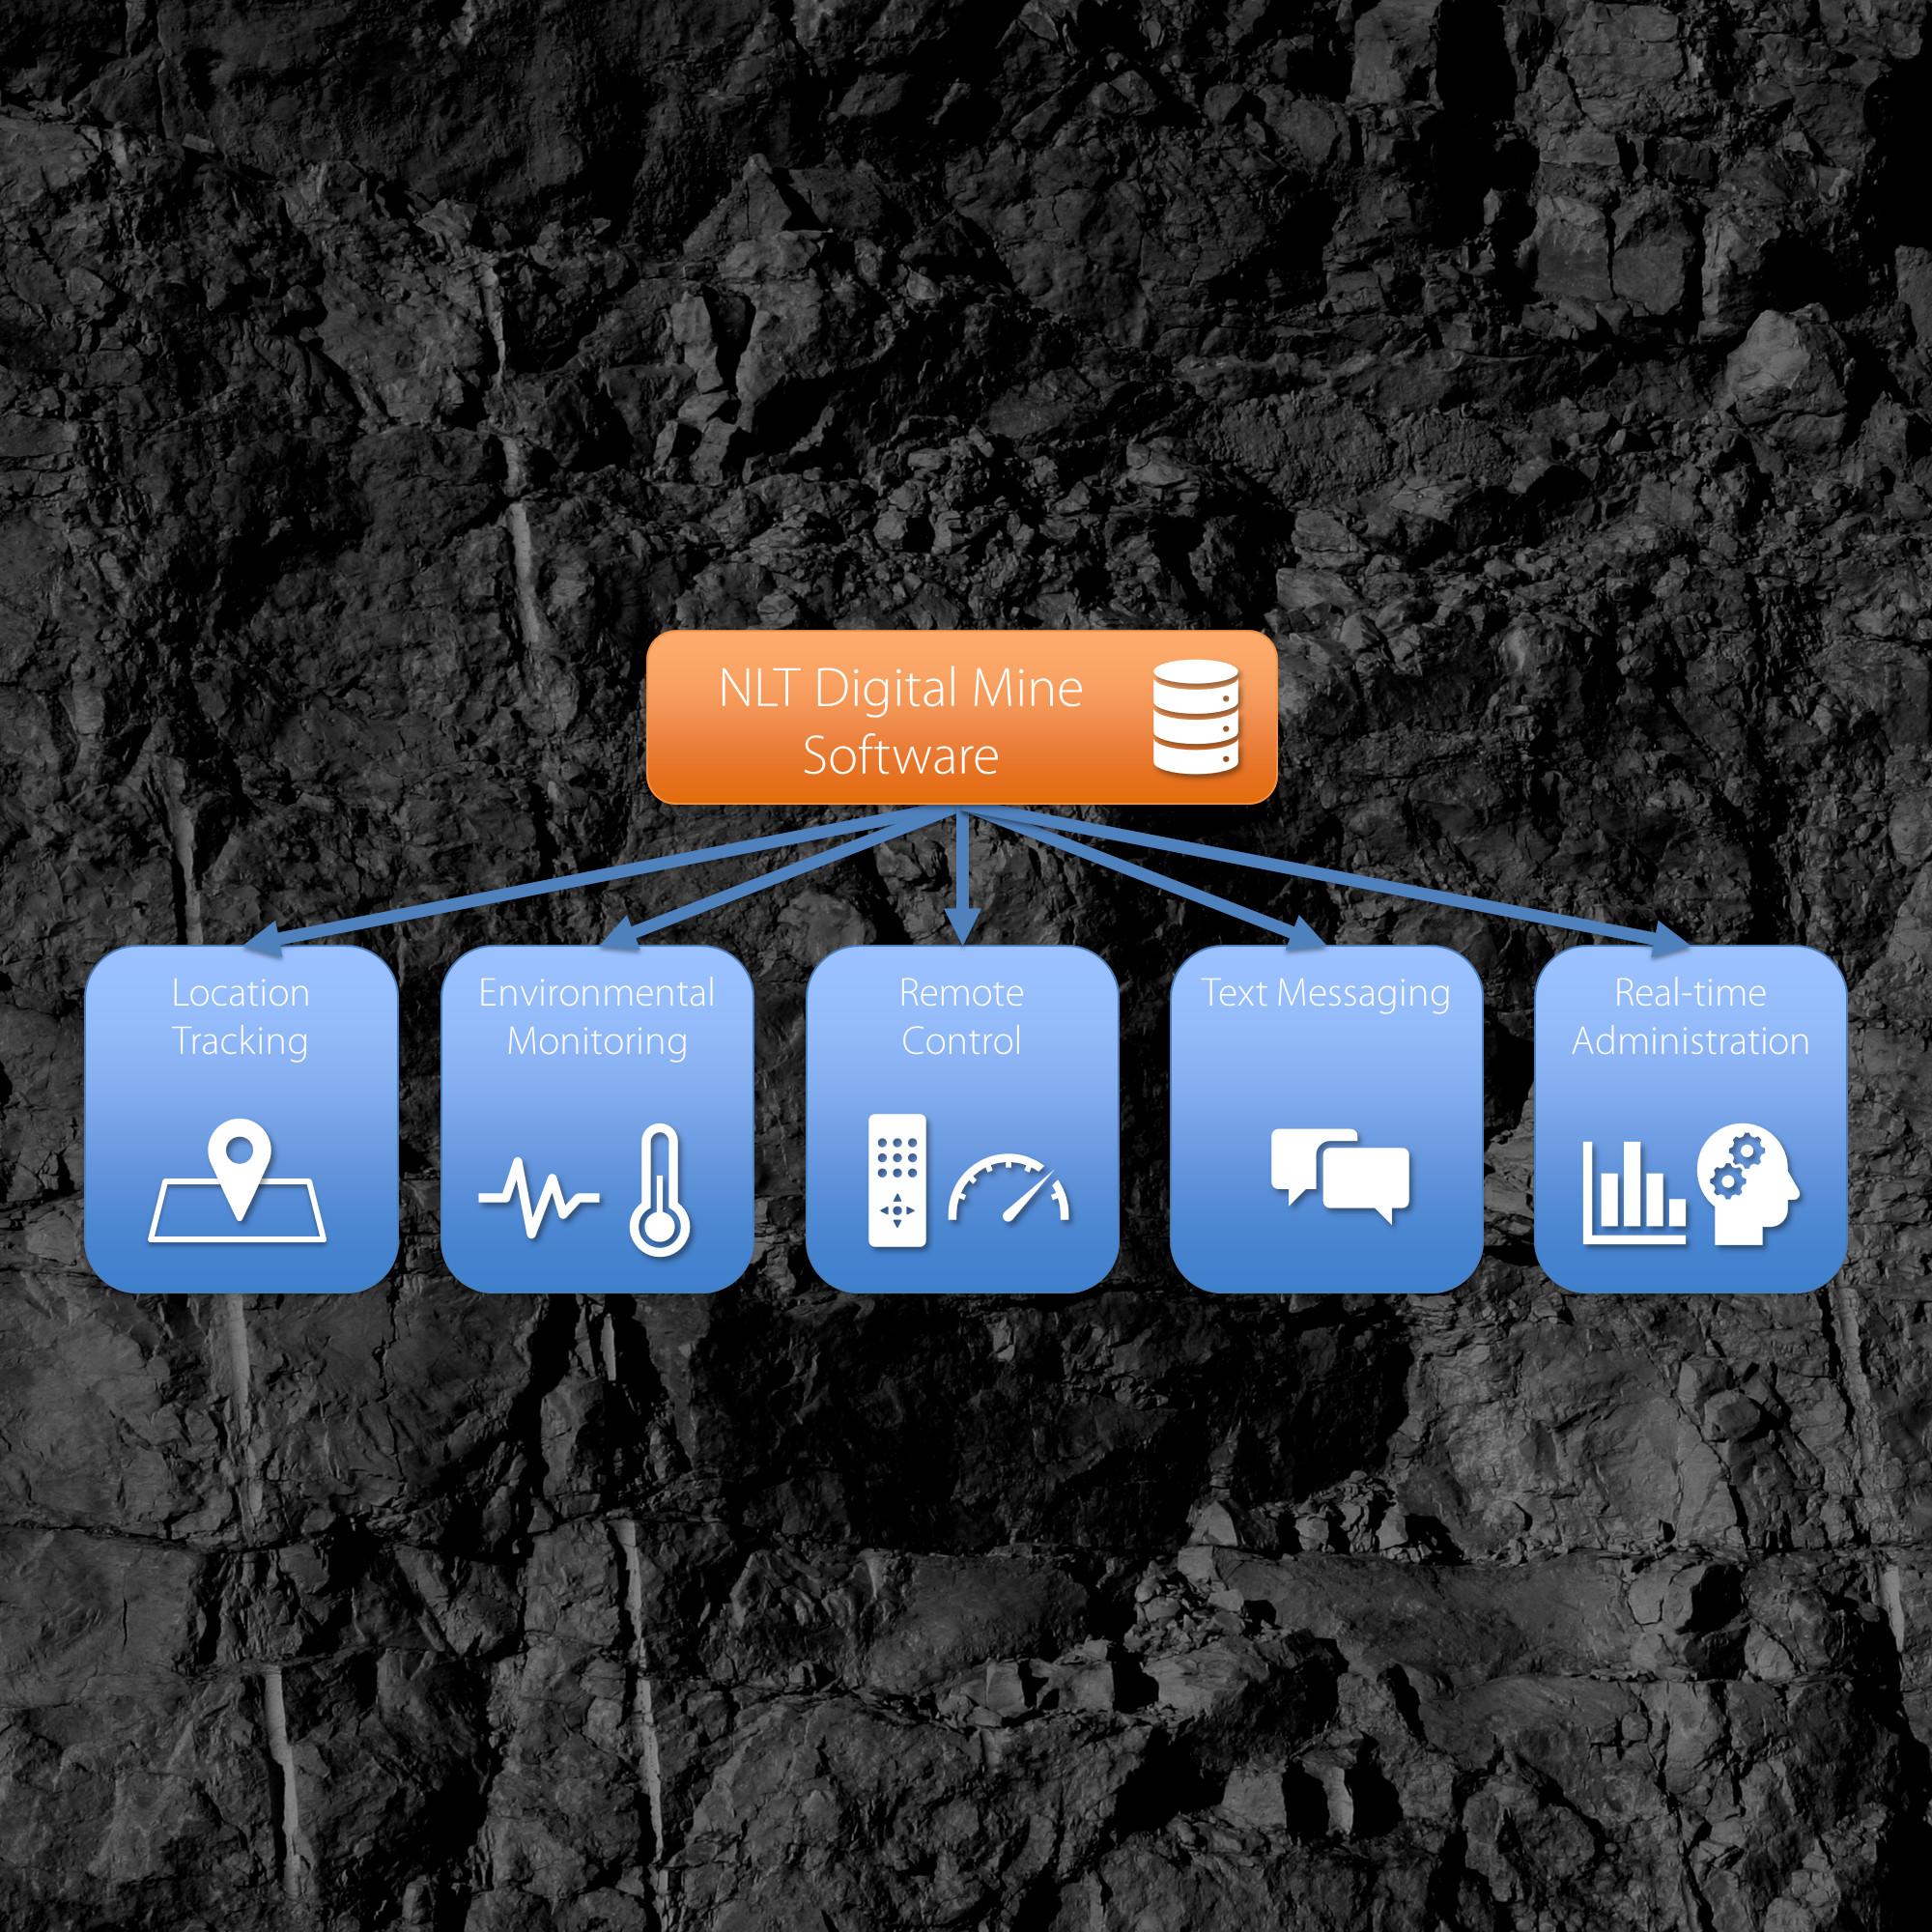 NLT Digital Mine Software